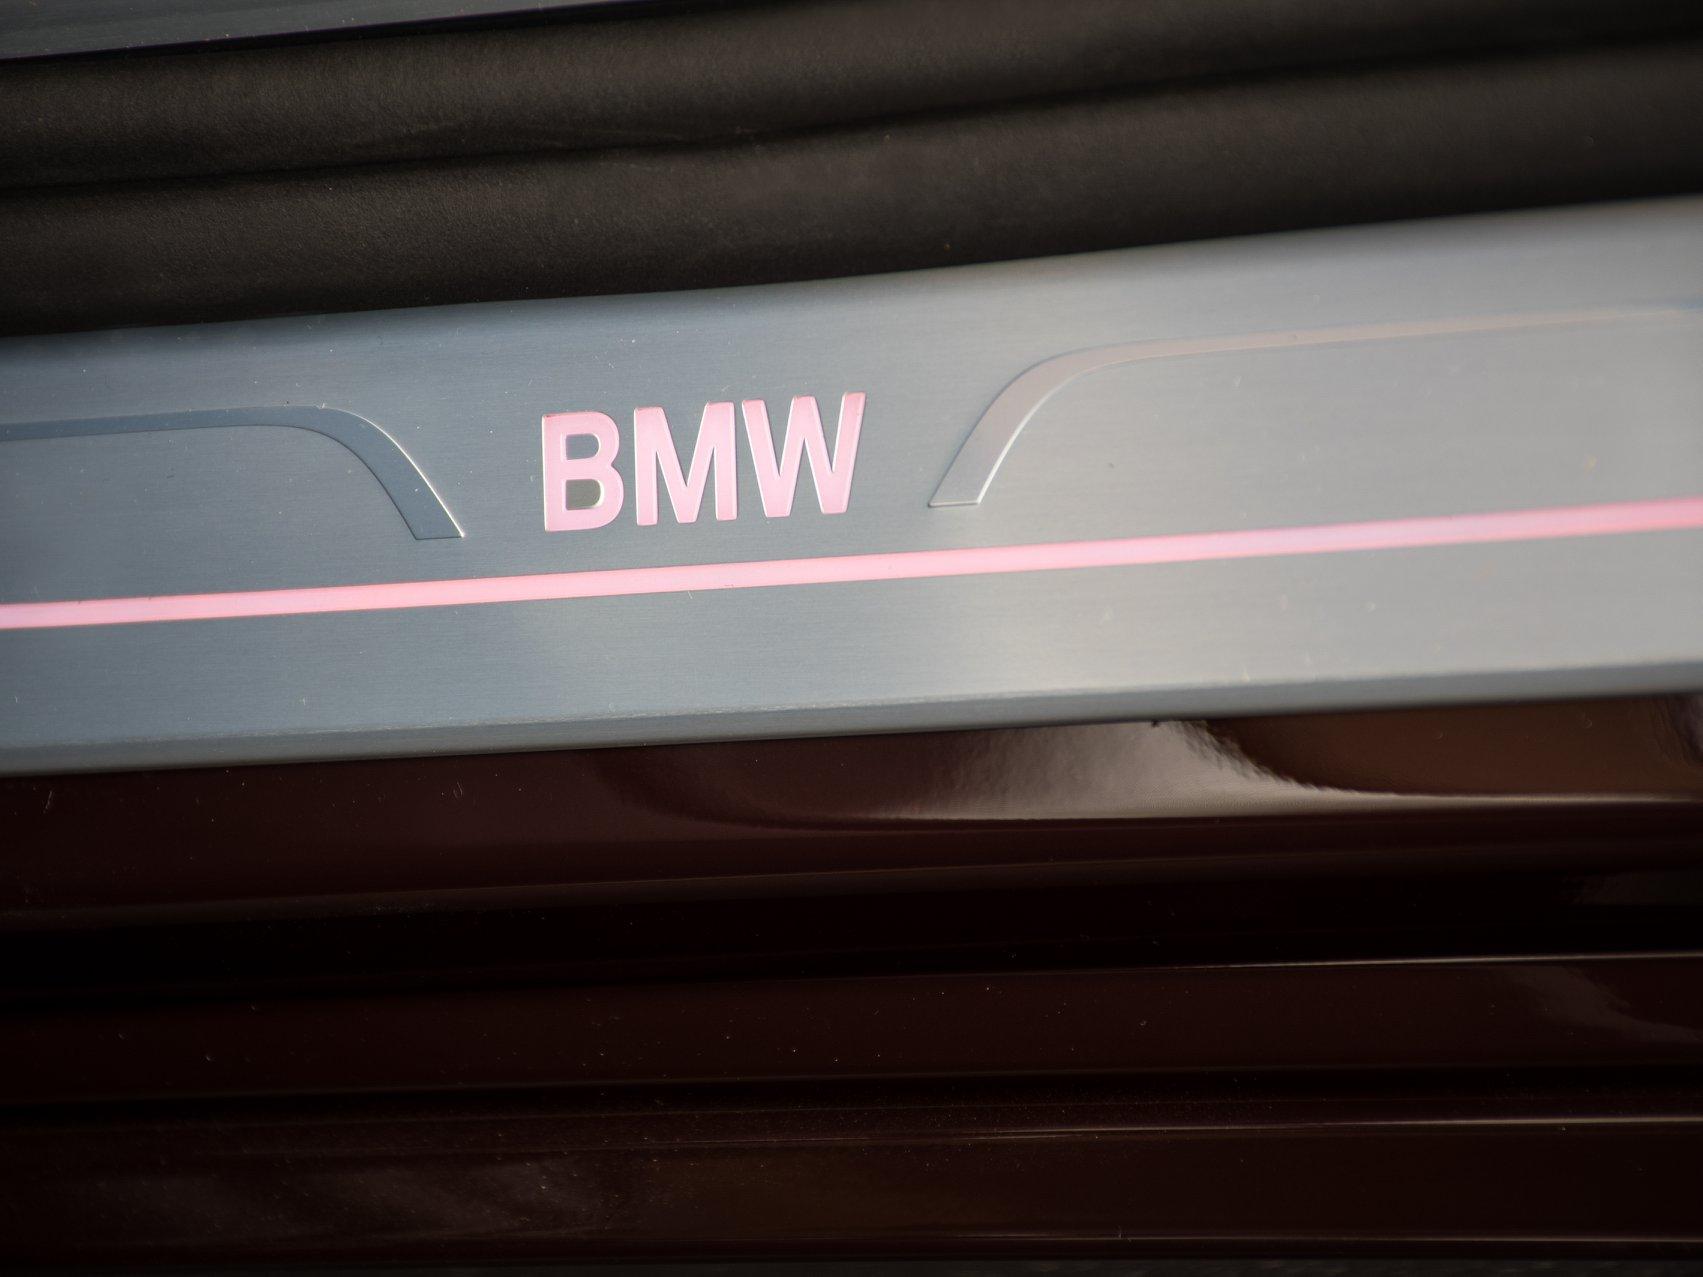 2020_BMW_750Li_Royal_Burgundy_Red_0018